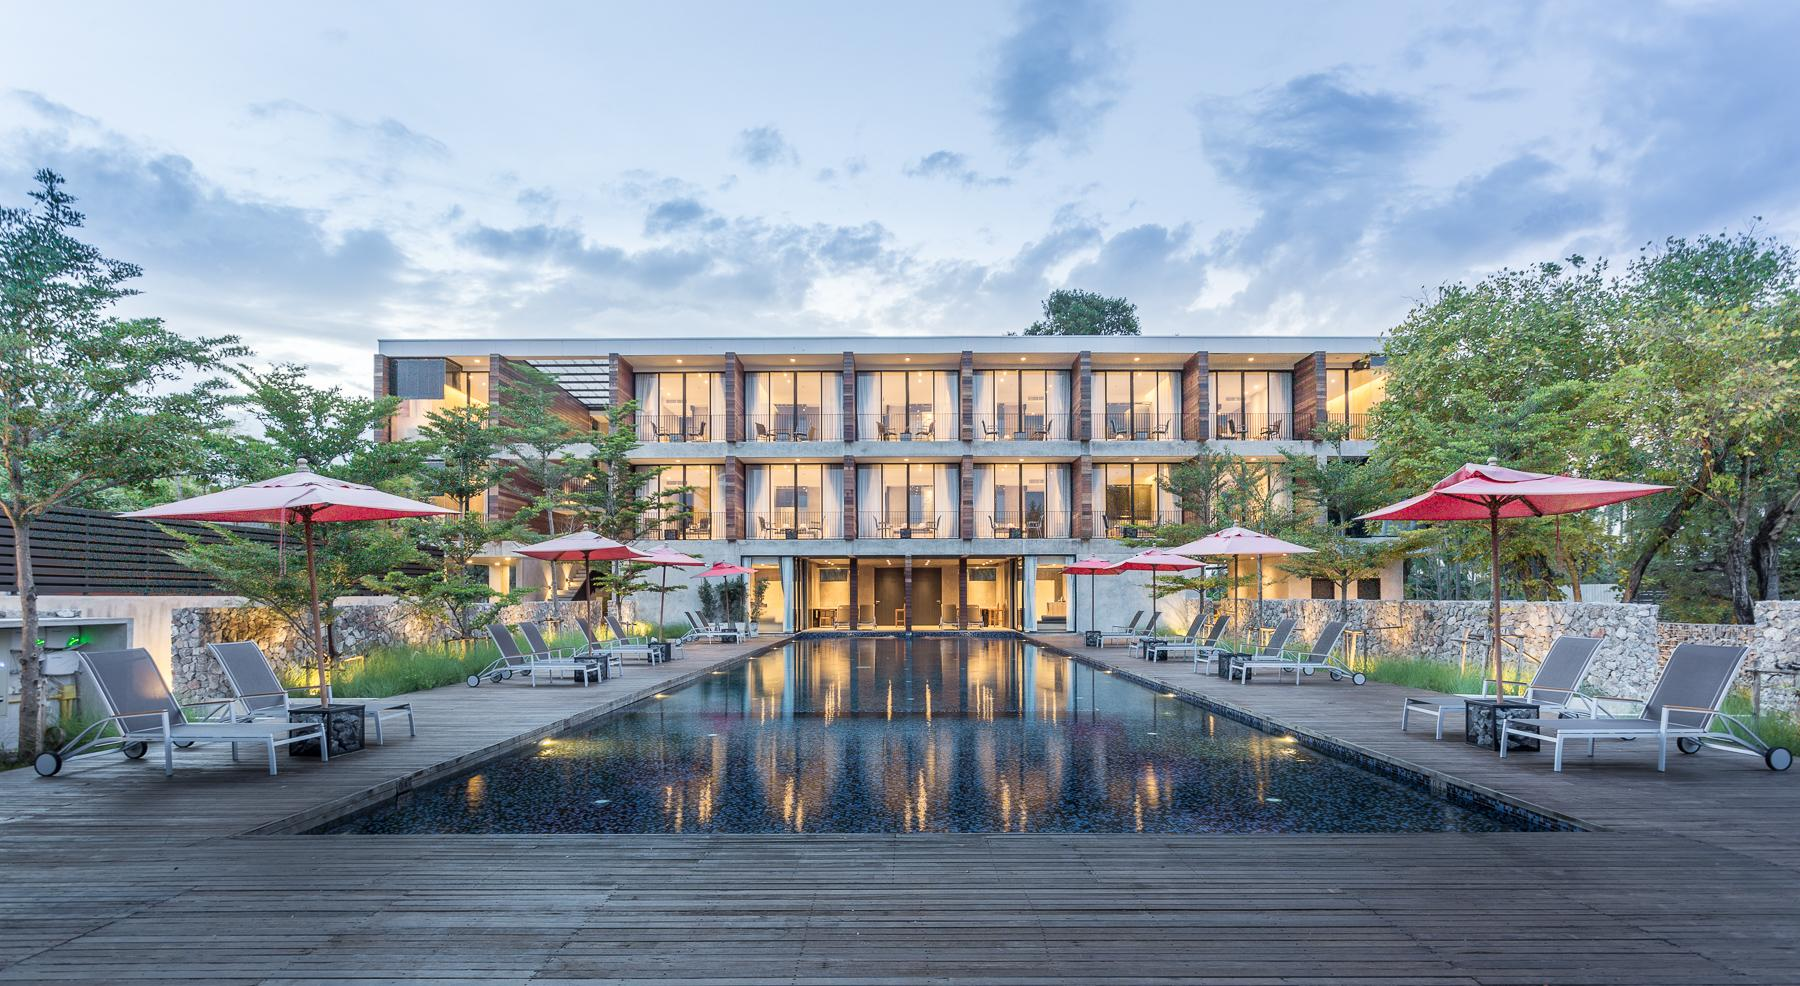 Lipda Resort, Muang Prachuap Khiri Khan